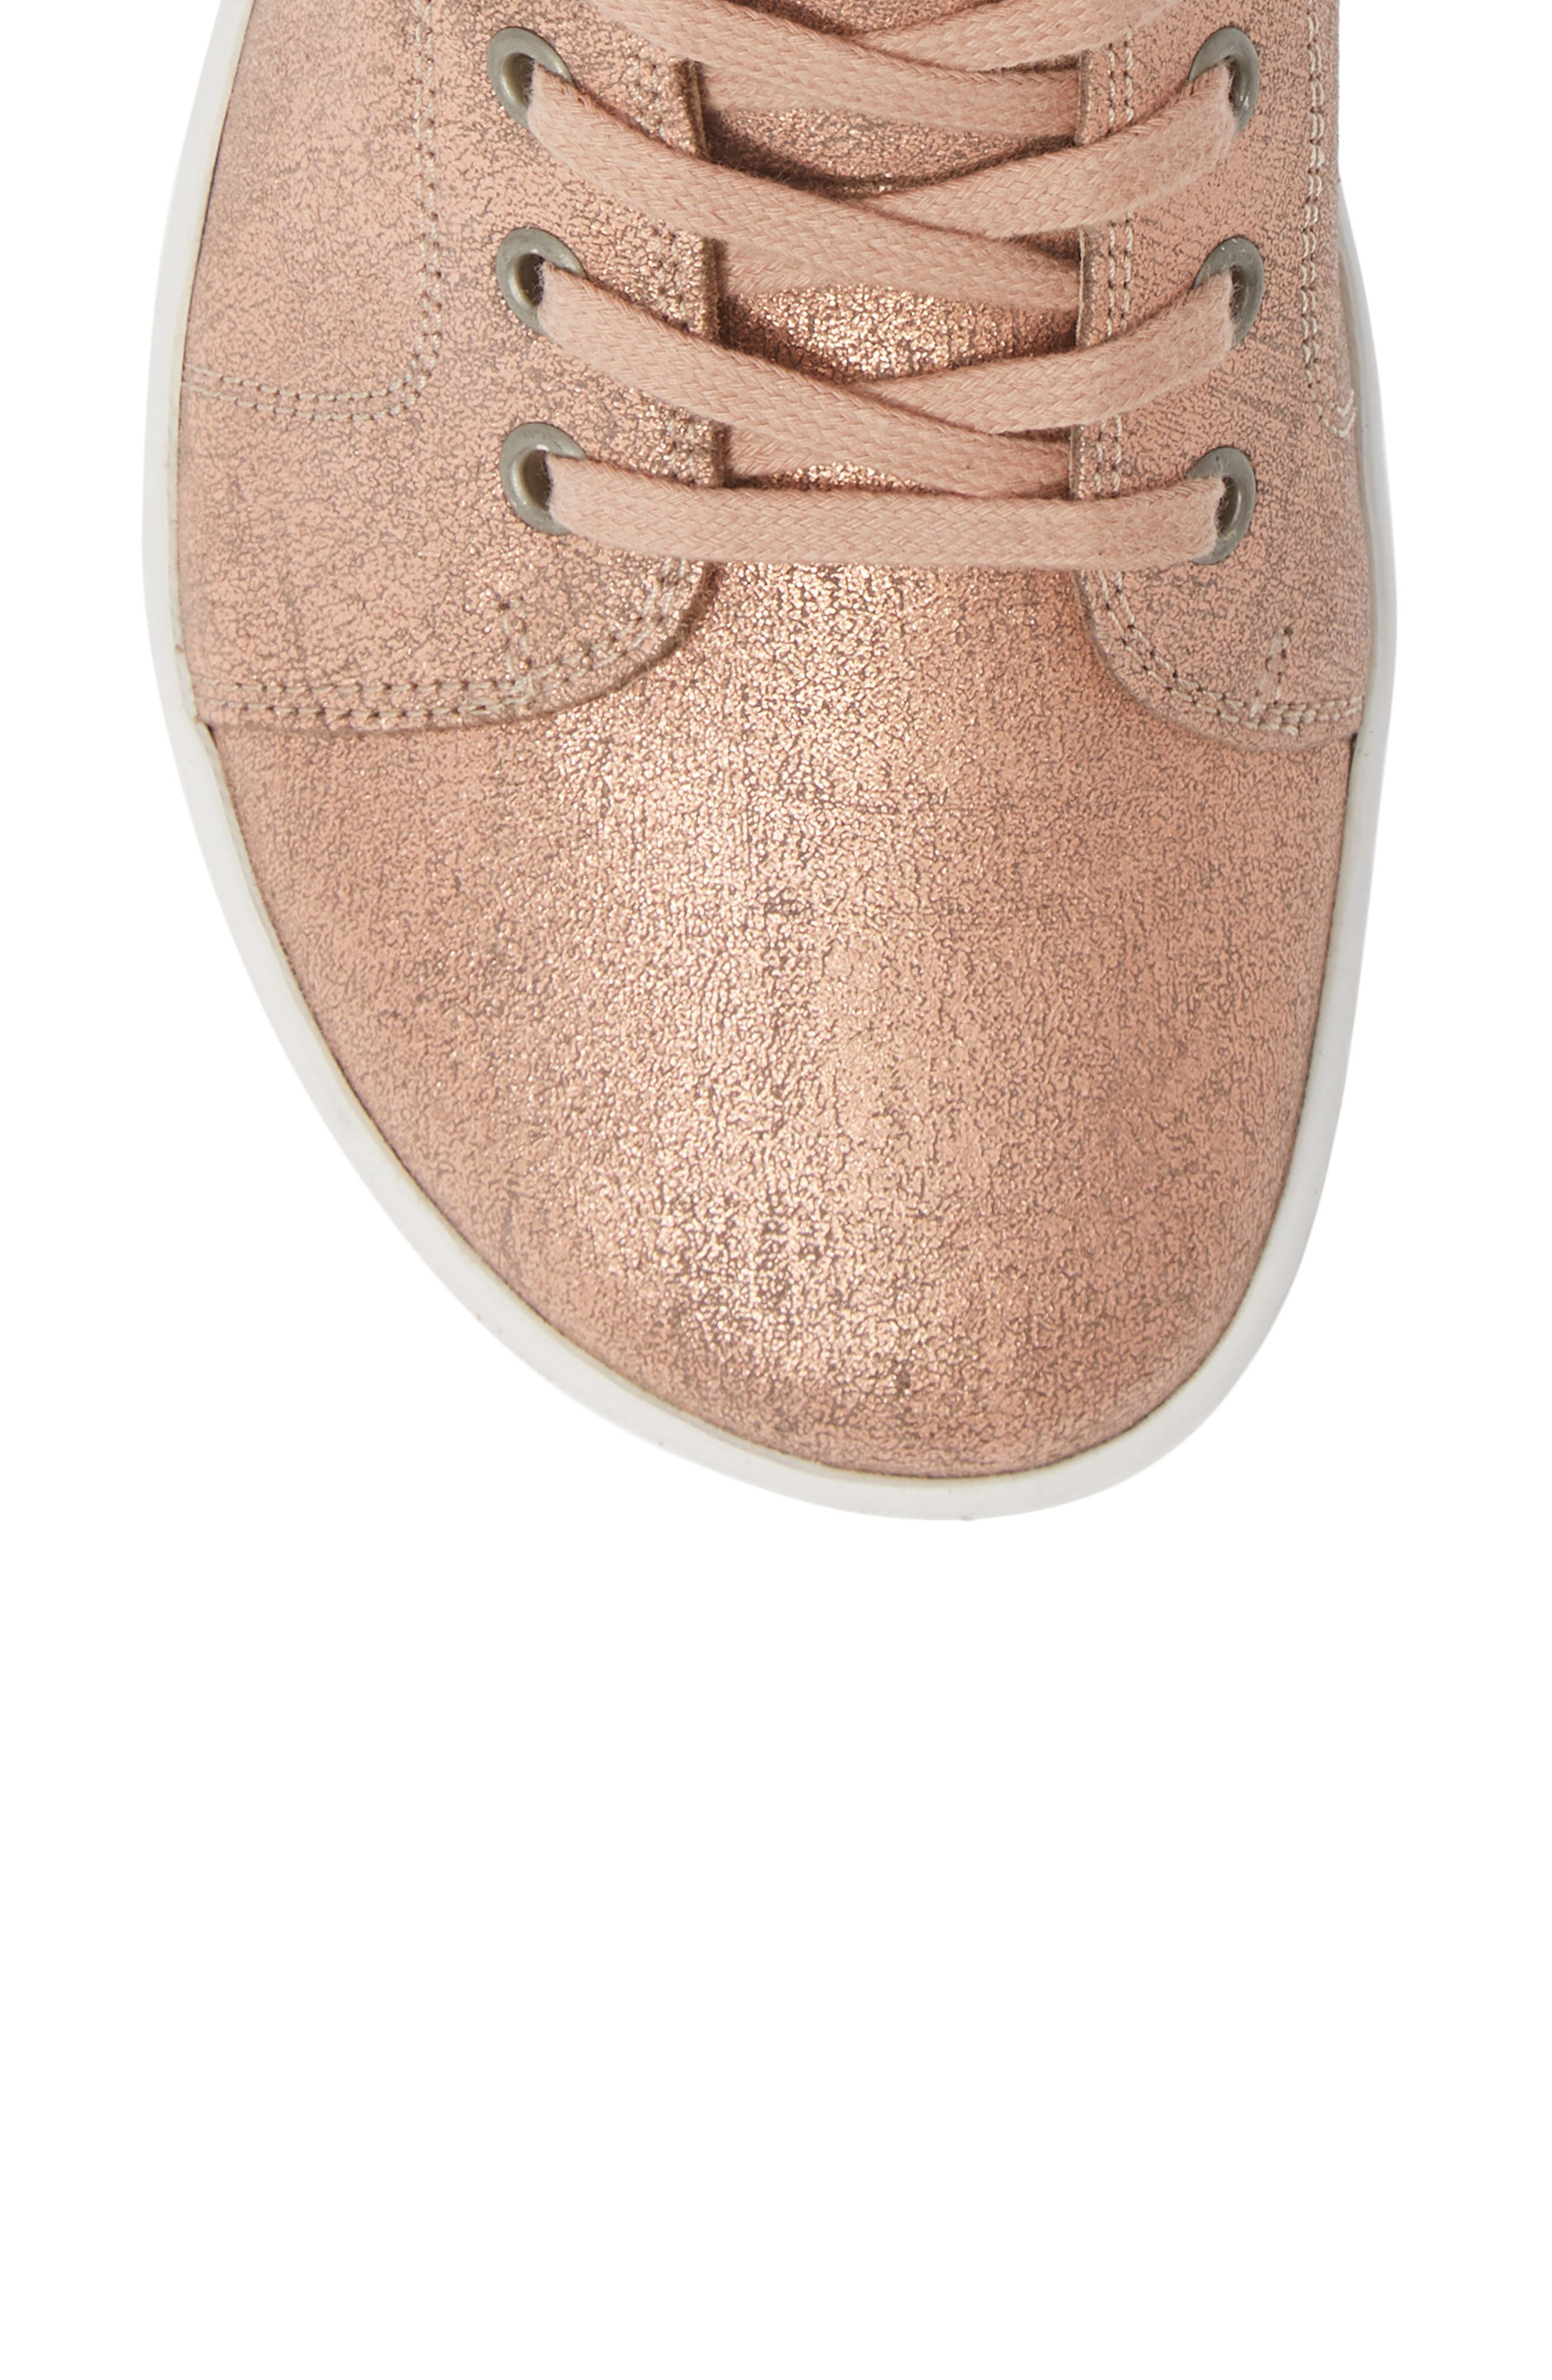 Bartlett High Top Sneaker,                             Alternate thumbnail 5, color,                             METALLIC ROSE LEATHER